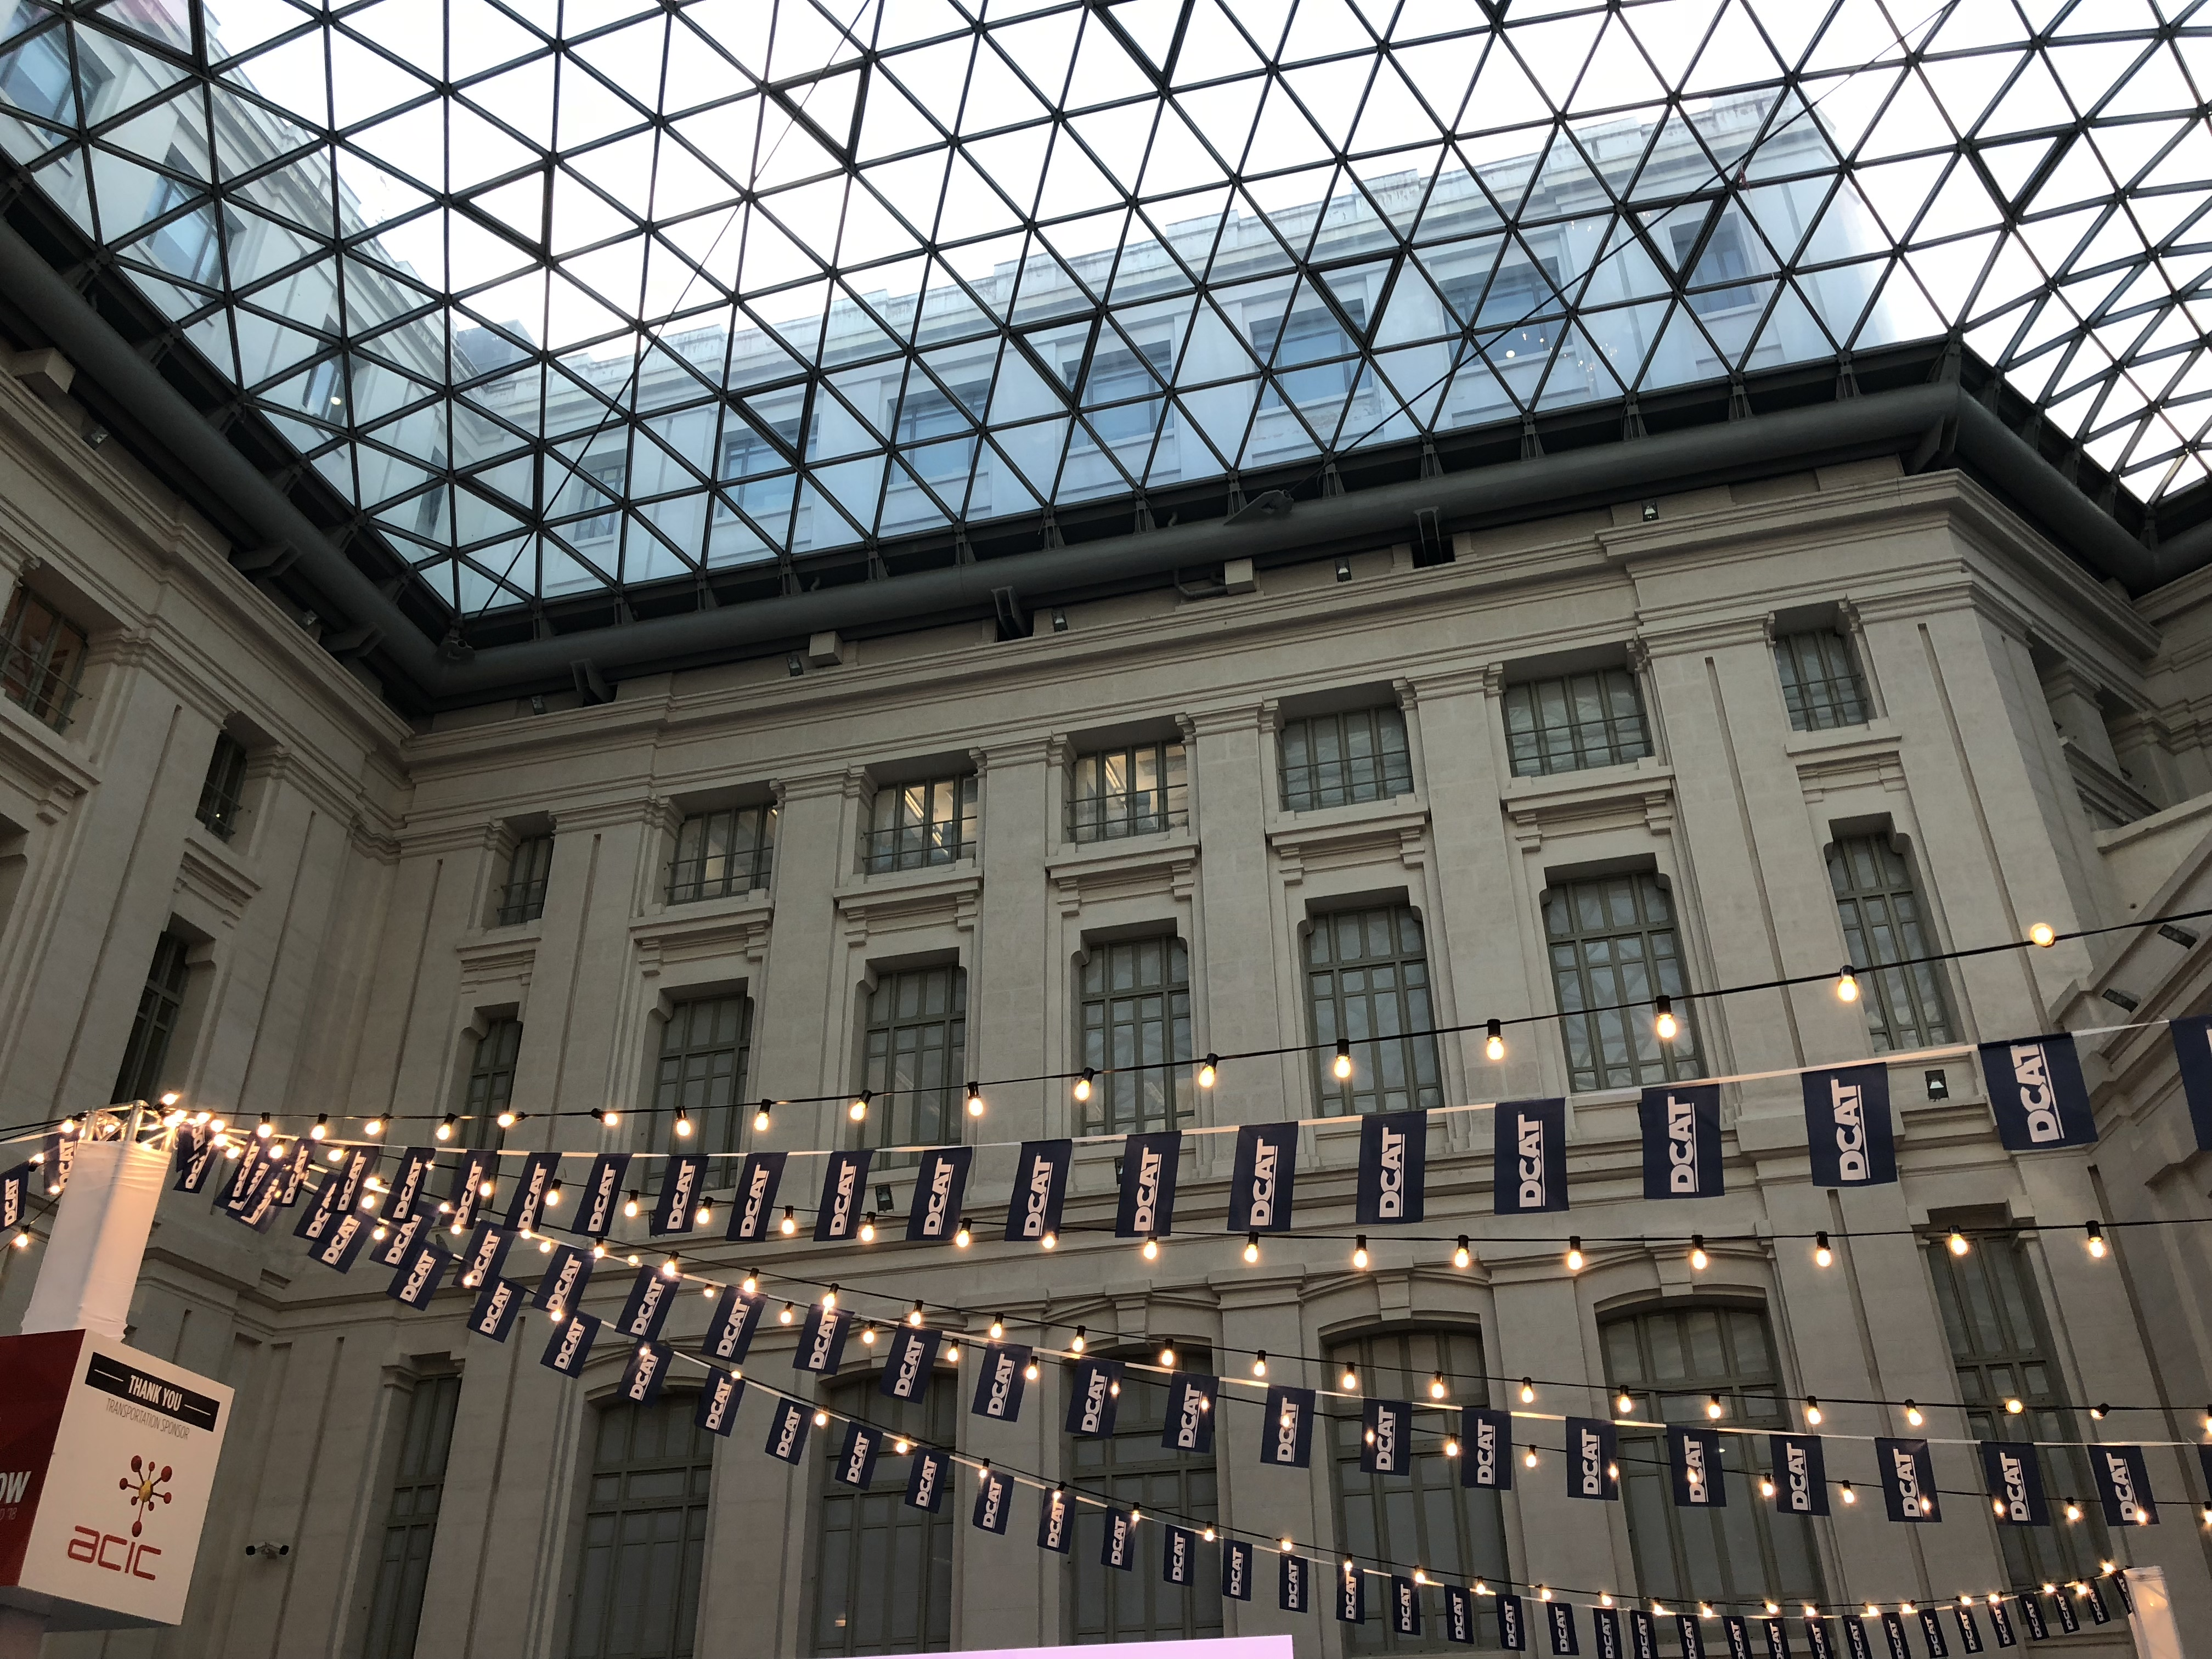 Madrid's Cibeles Palace Glass Gallery